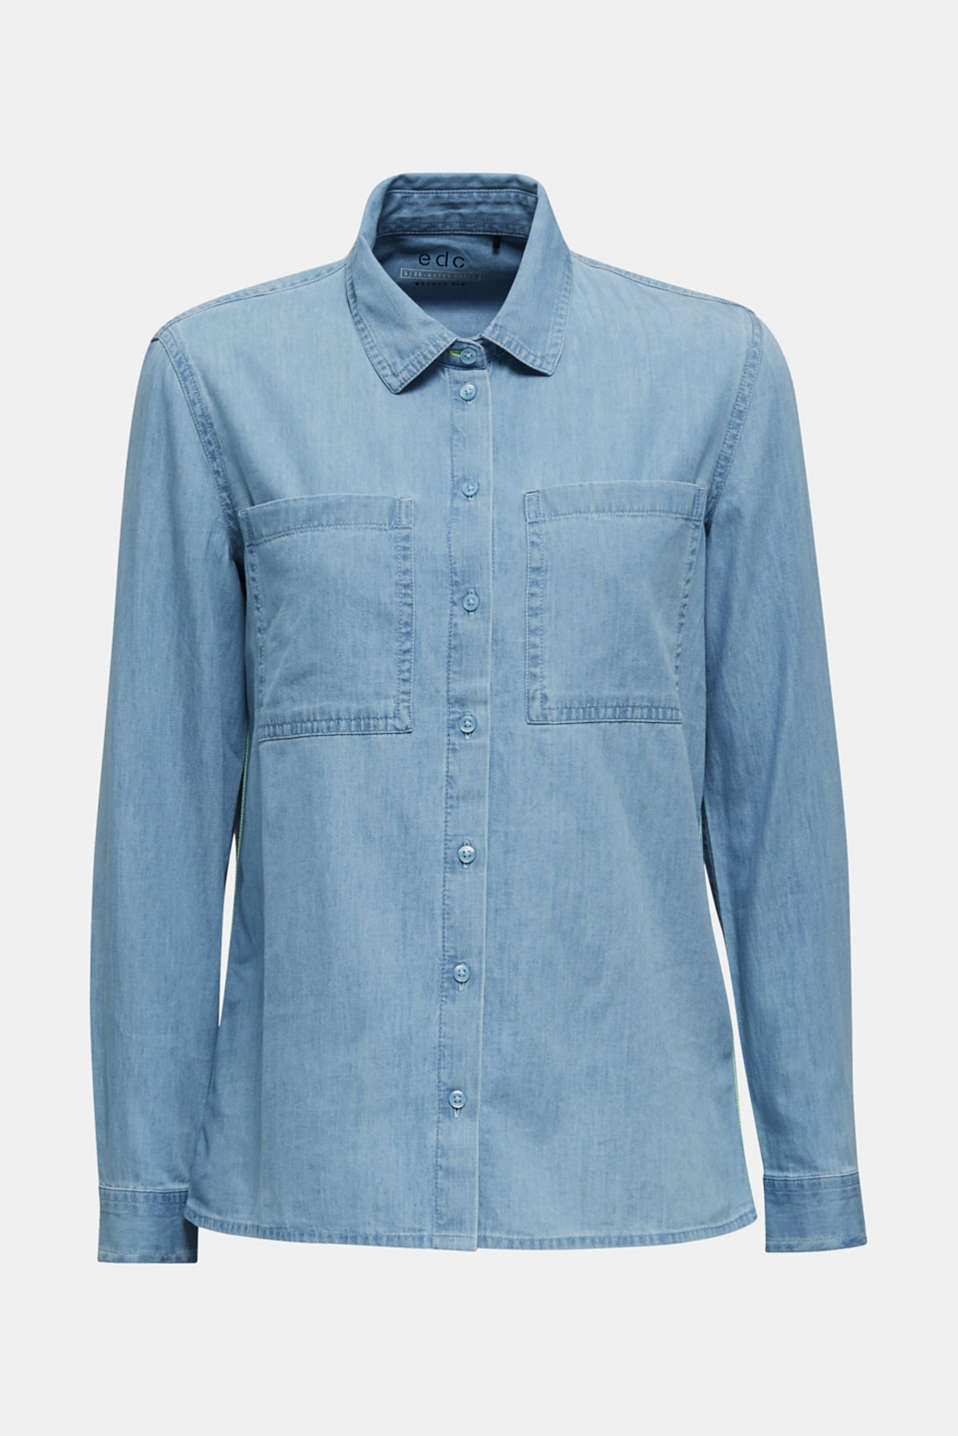 Bleached denim shirt with pockets, 100% cotton, BLUE LIGHT WASH, detail image number 6